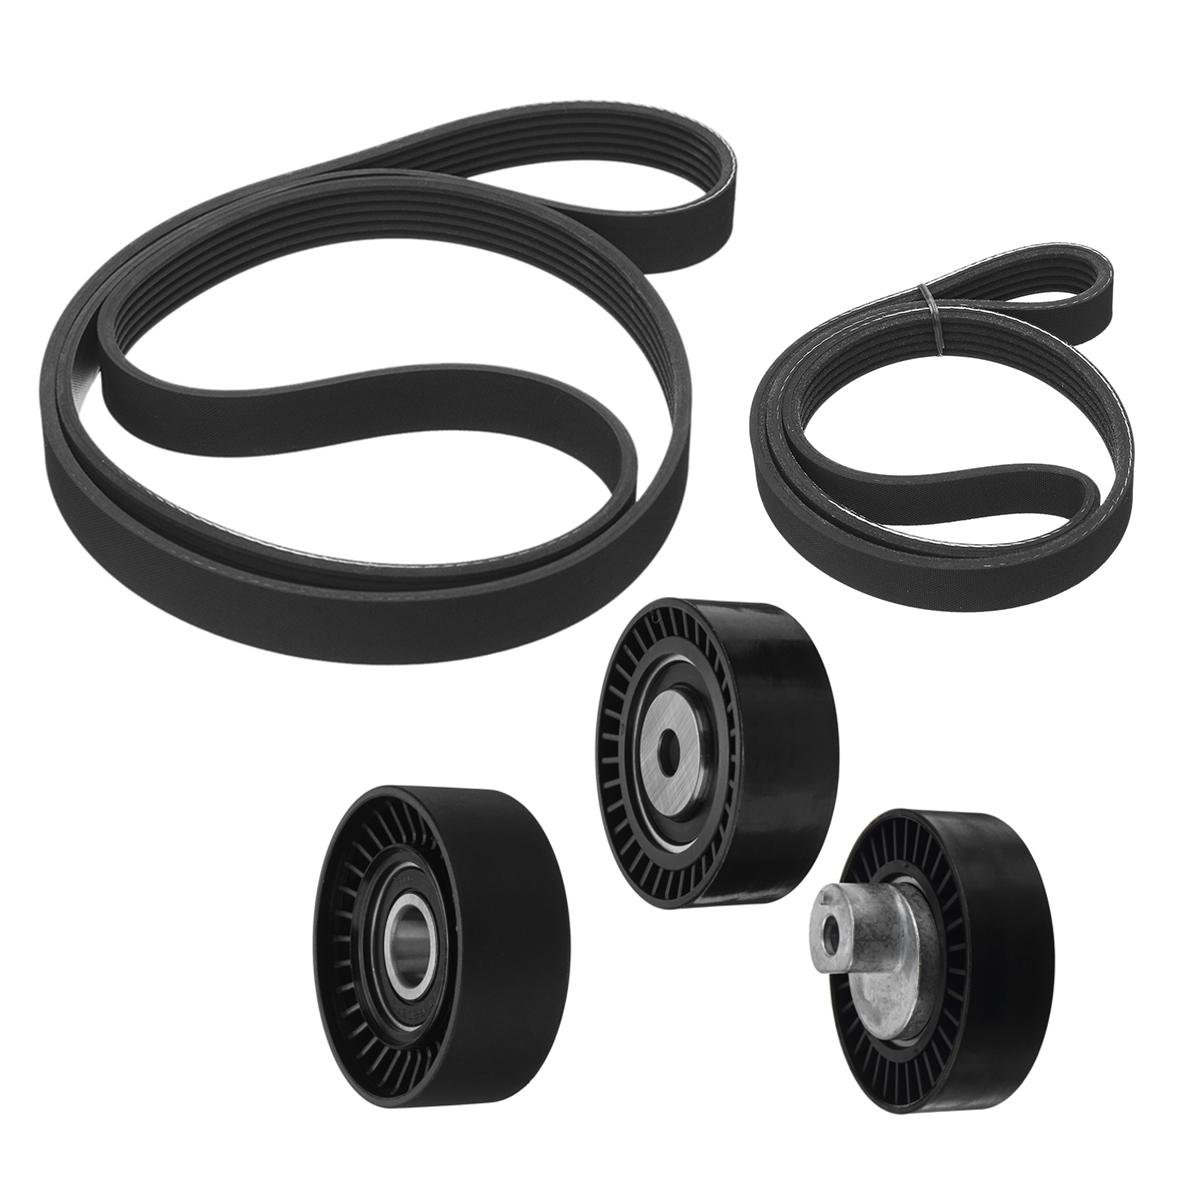 Car Engine Timing Belt Tensioner Pulley Kit For BMW E46 E39 E38 X5 E53 Z3 E36